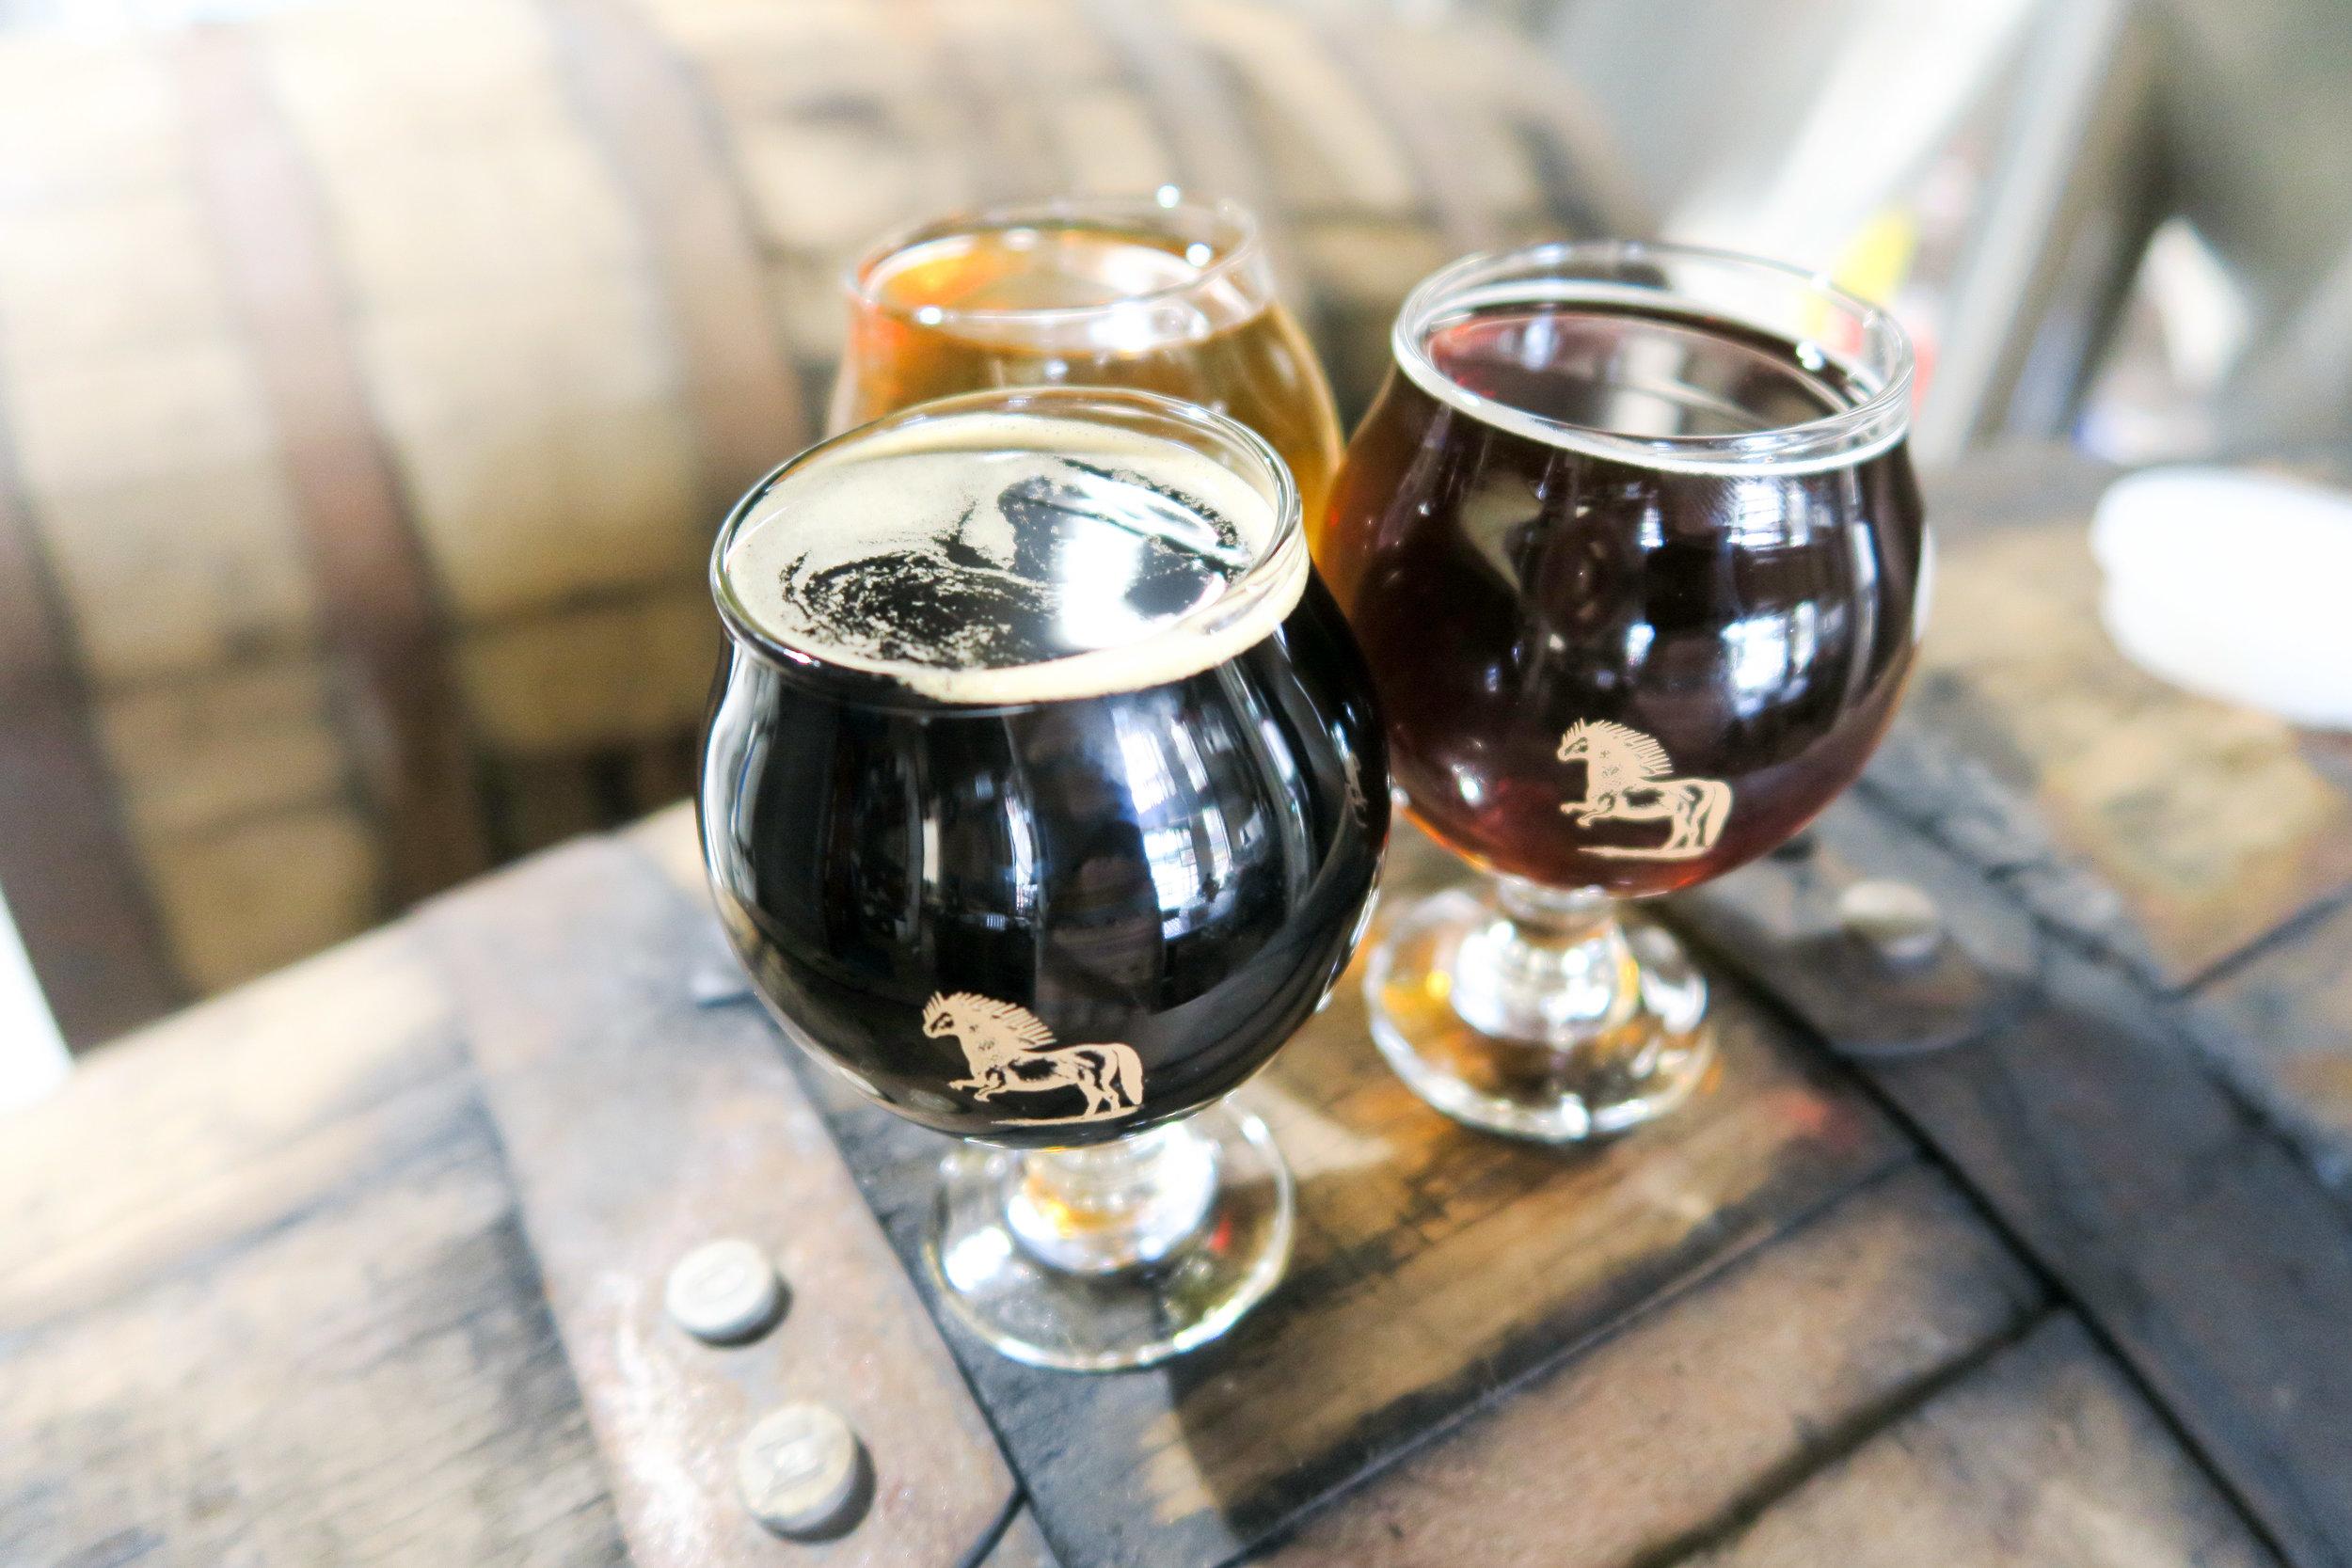 Bourbon Barrel Aged Beers sm-24.jpg